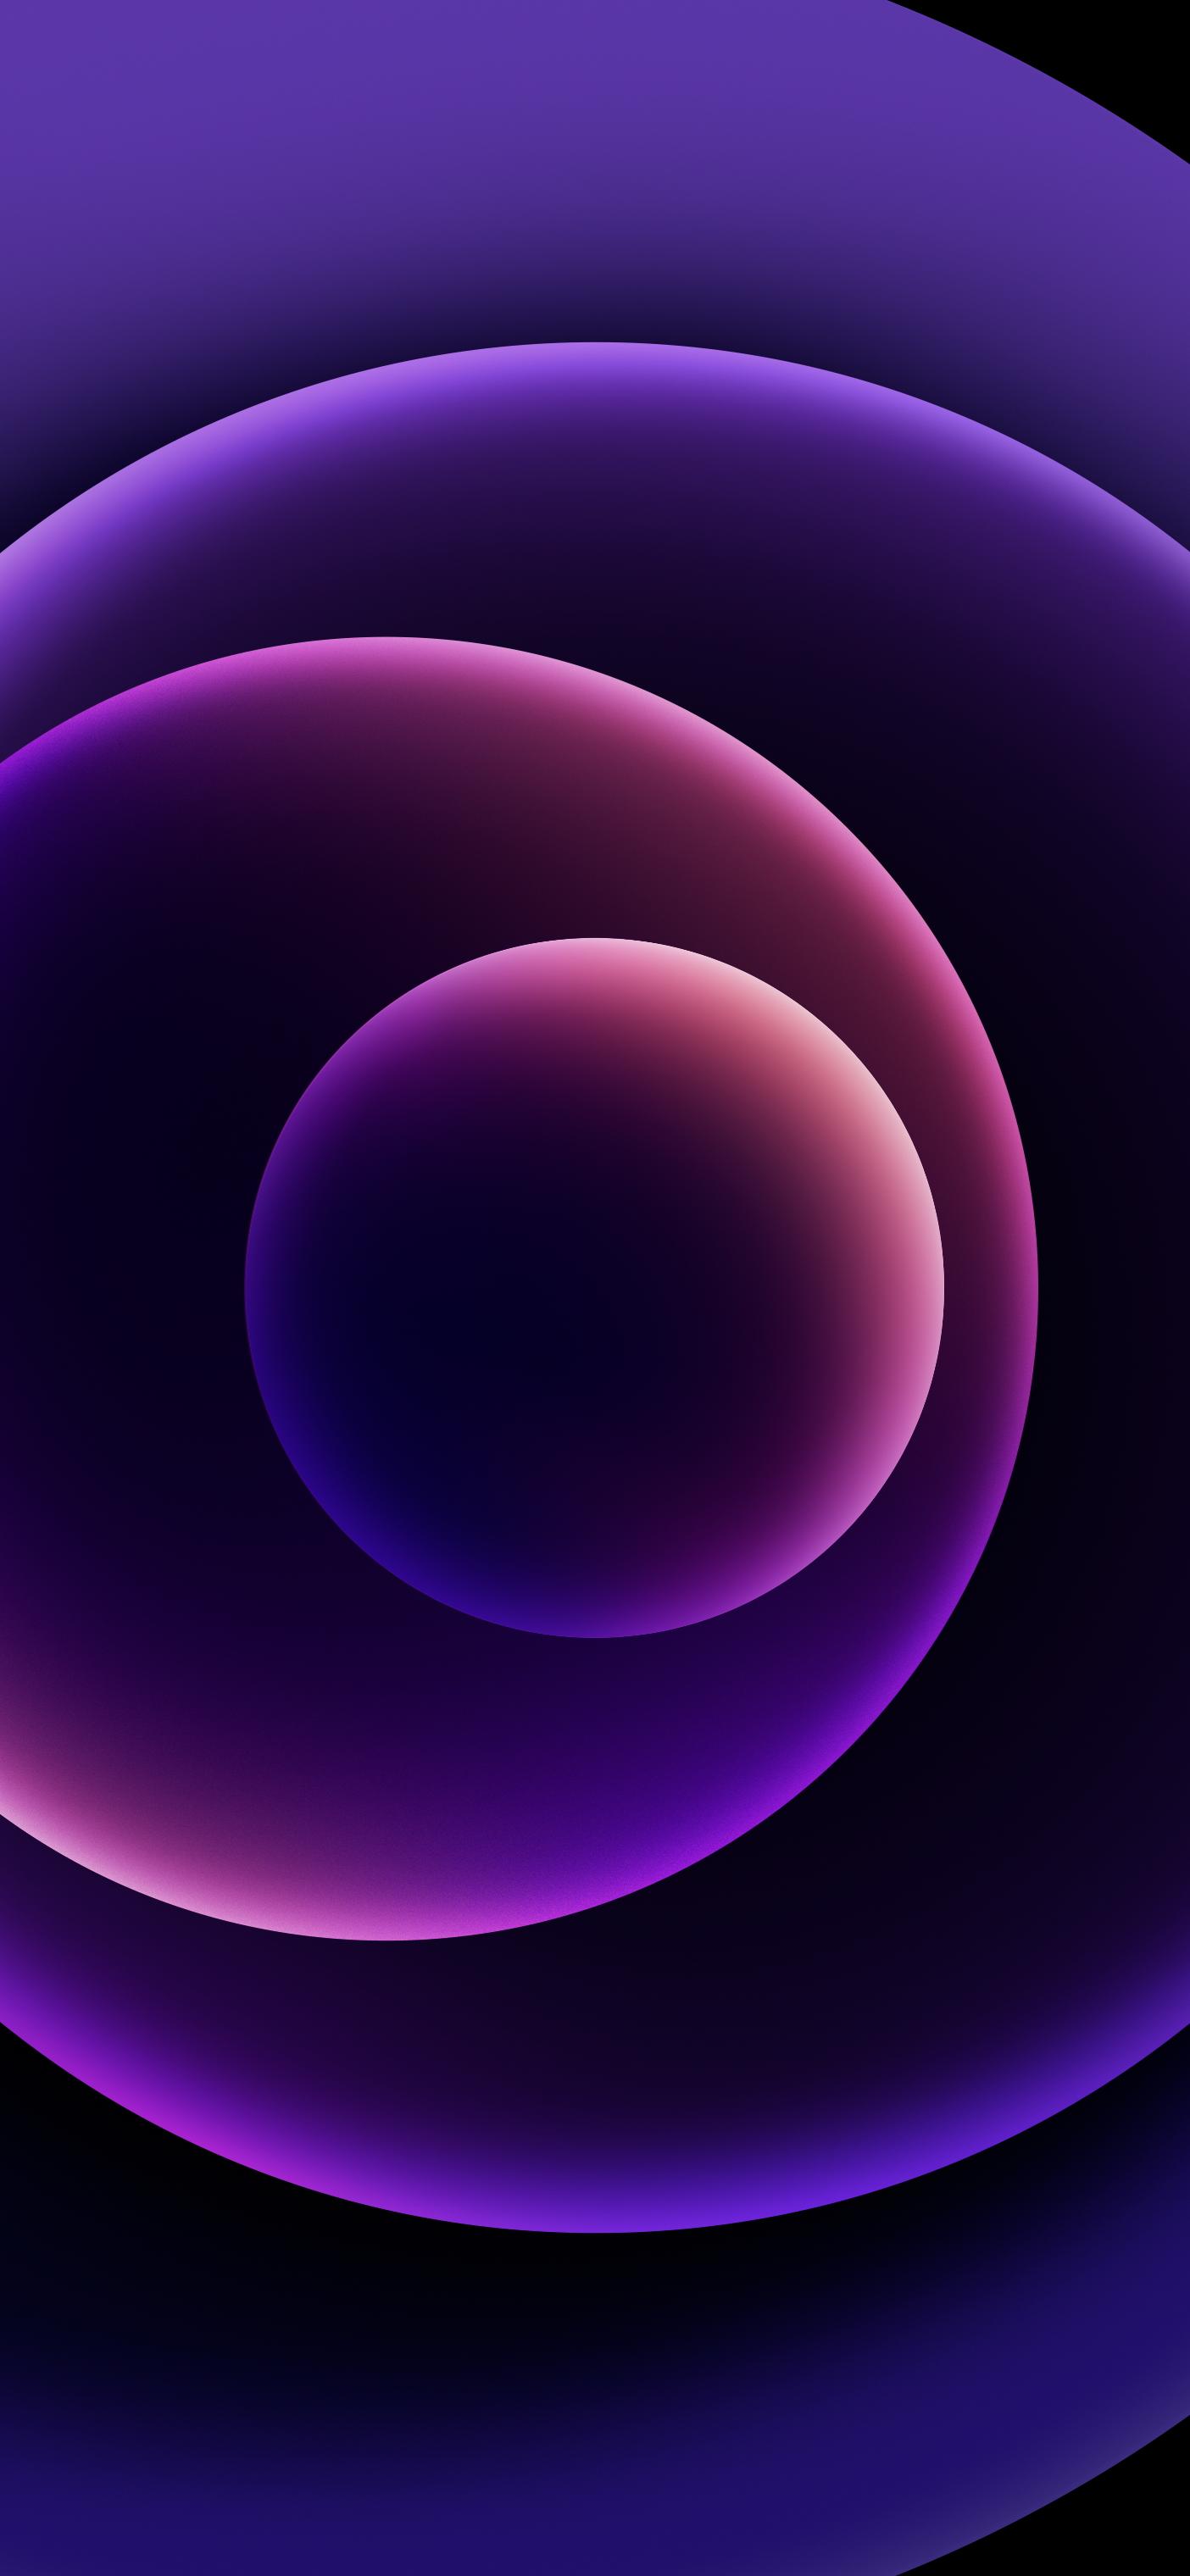 iPhone 12 Purple wallpaper (Dark) @AR72014 idownloadblog